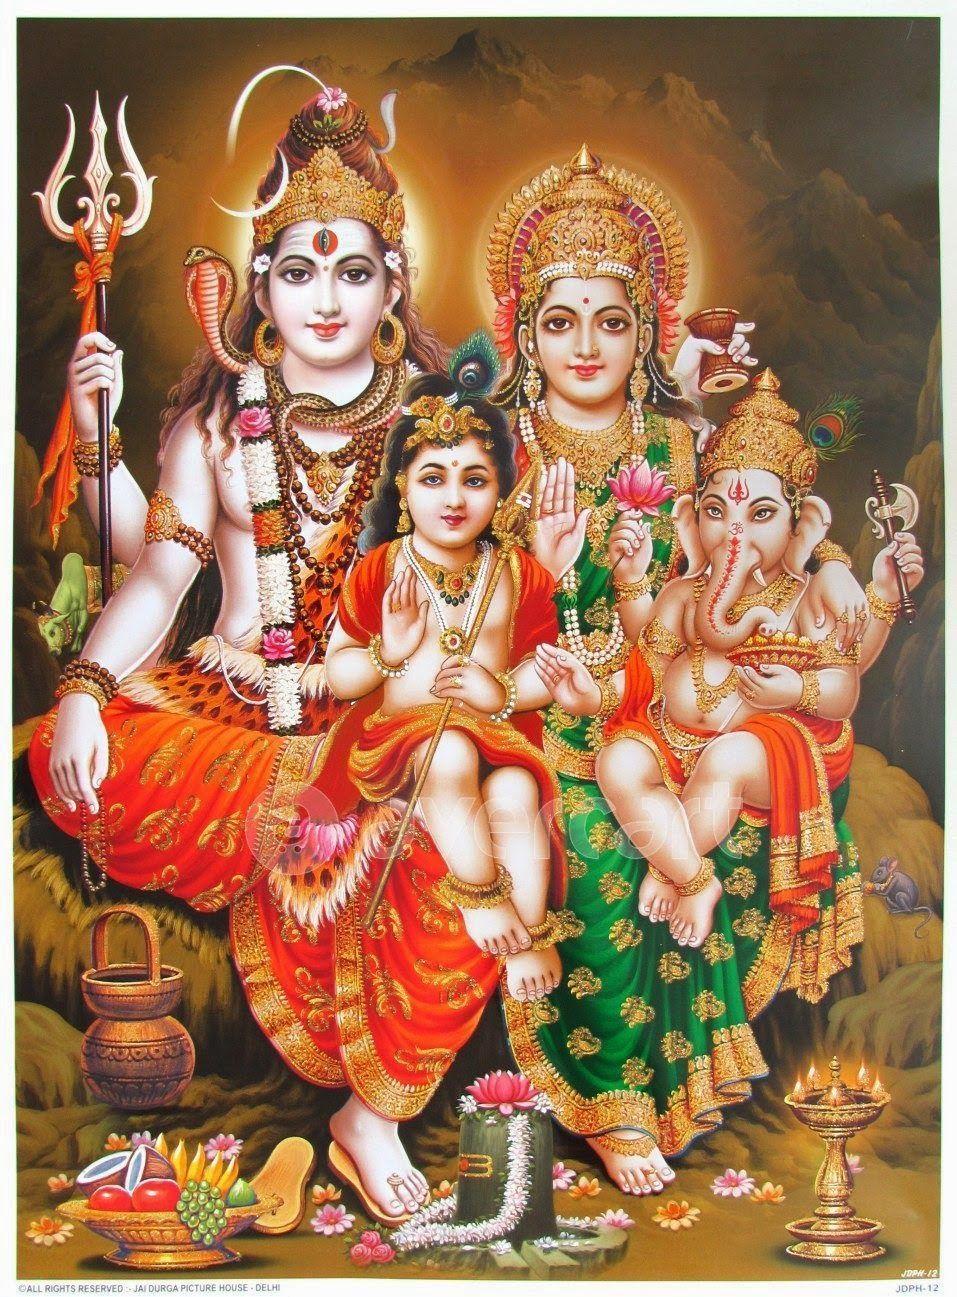 Lord Shiva and Maa Parvati Wallpapers - HD Wallpaper Pictures |Shiva Parvati Love Wallpaper